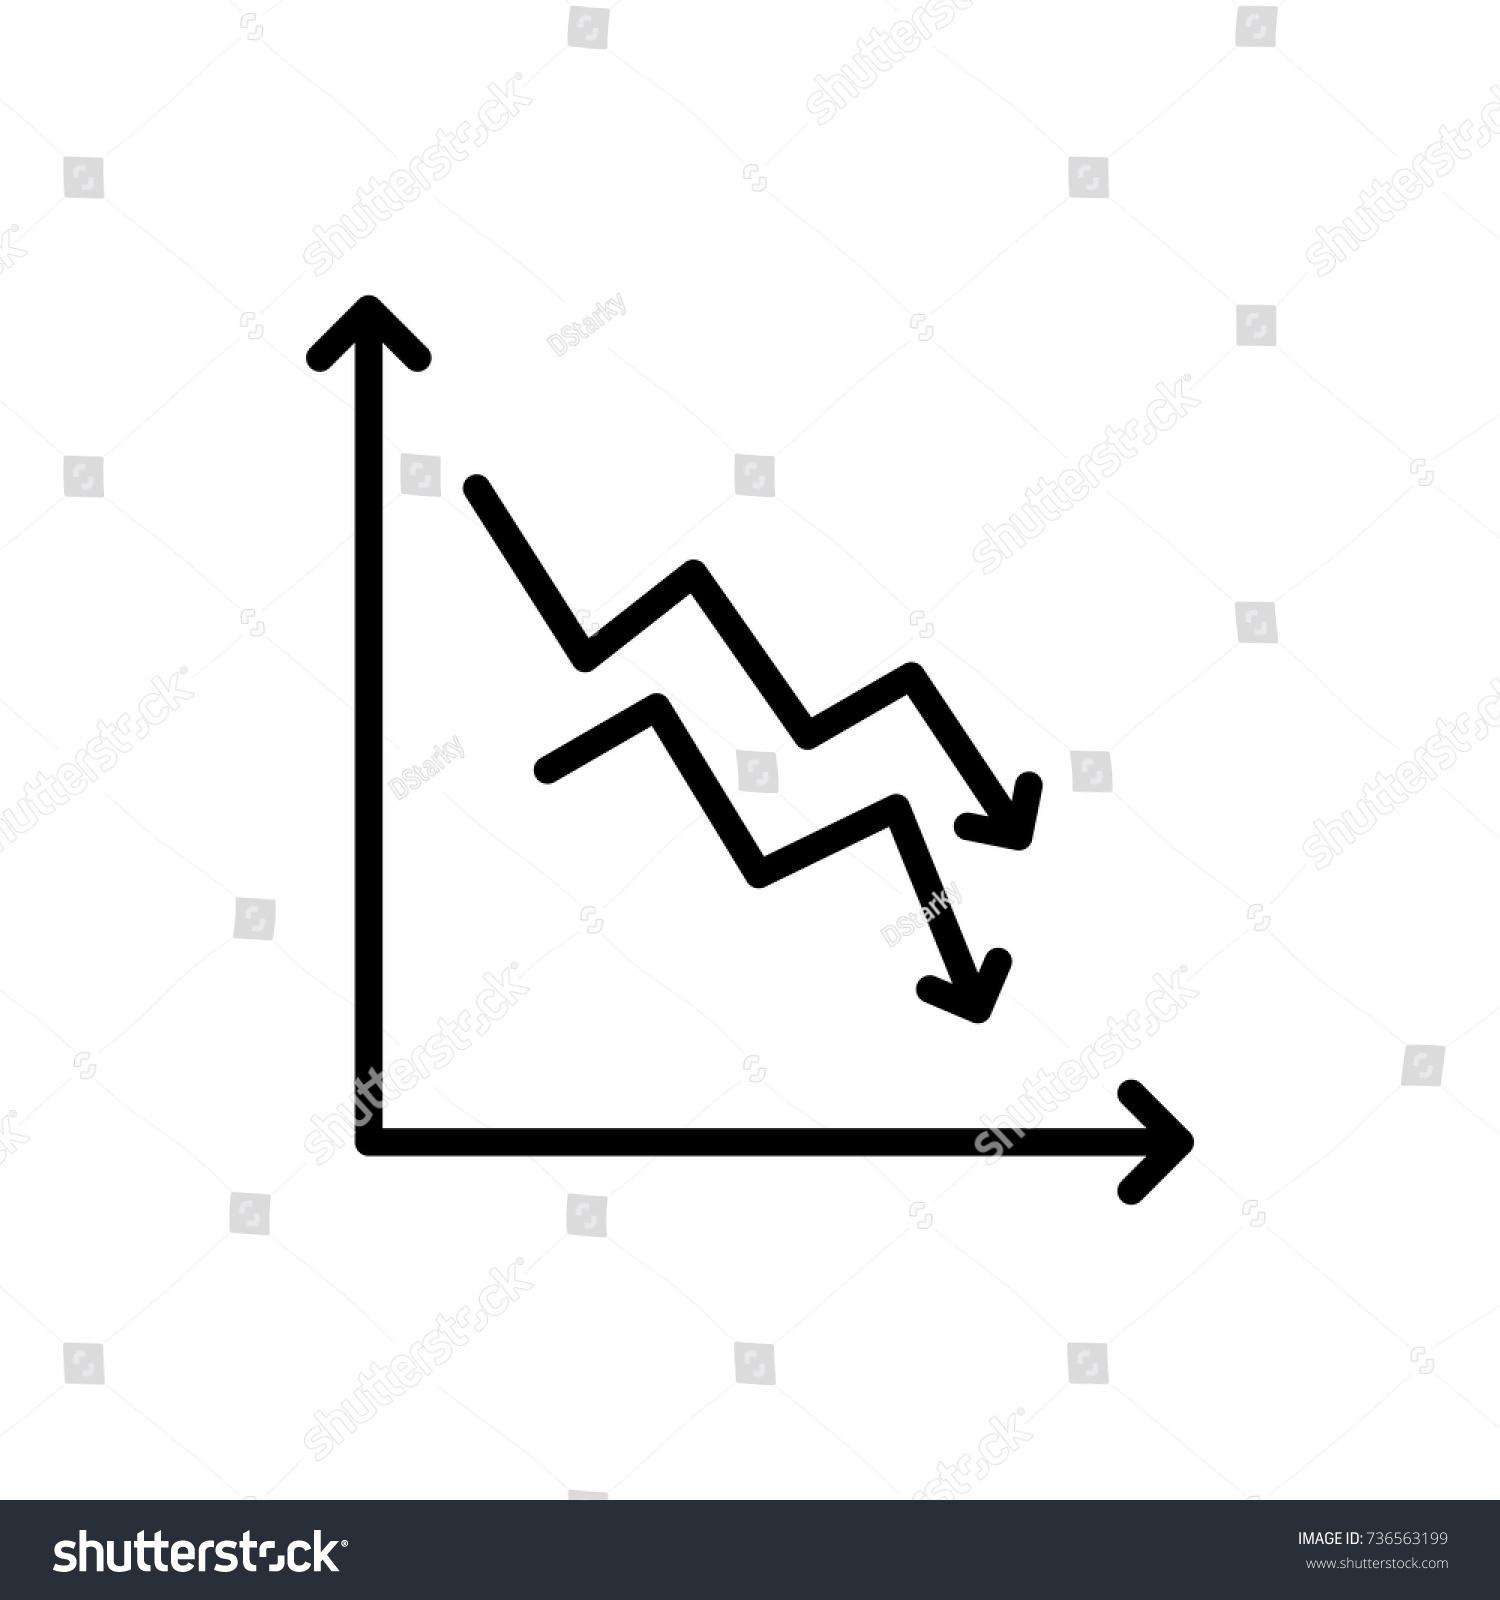 Modern data line icon premium pictogram stock vector 736563199 modern data line icon premium pictogram isolated on a white background vector illustration biocorpaavc